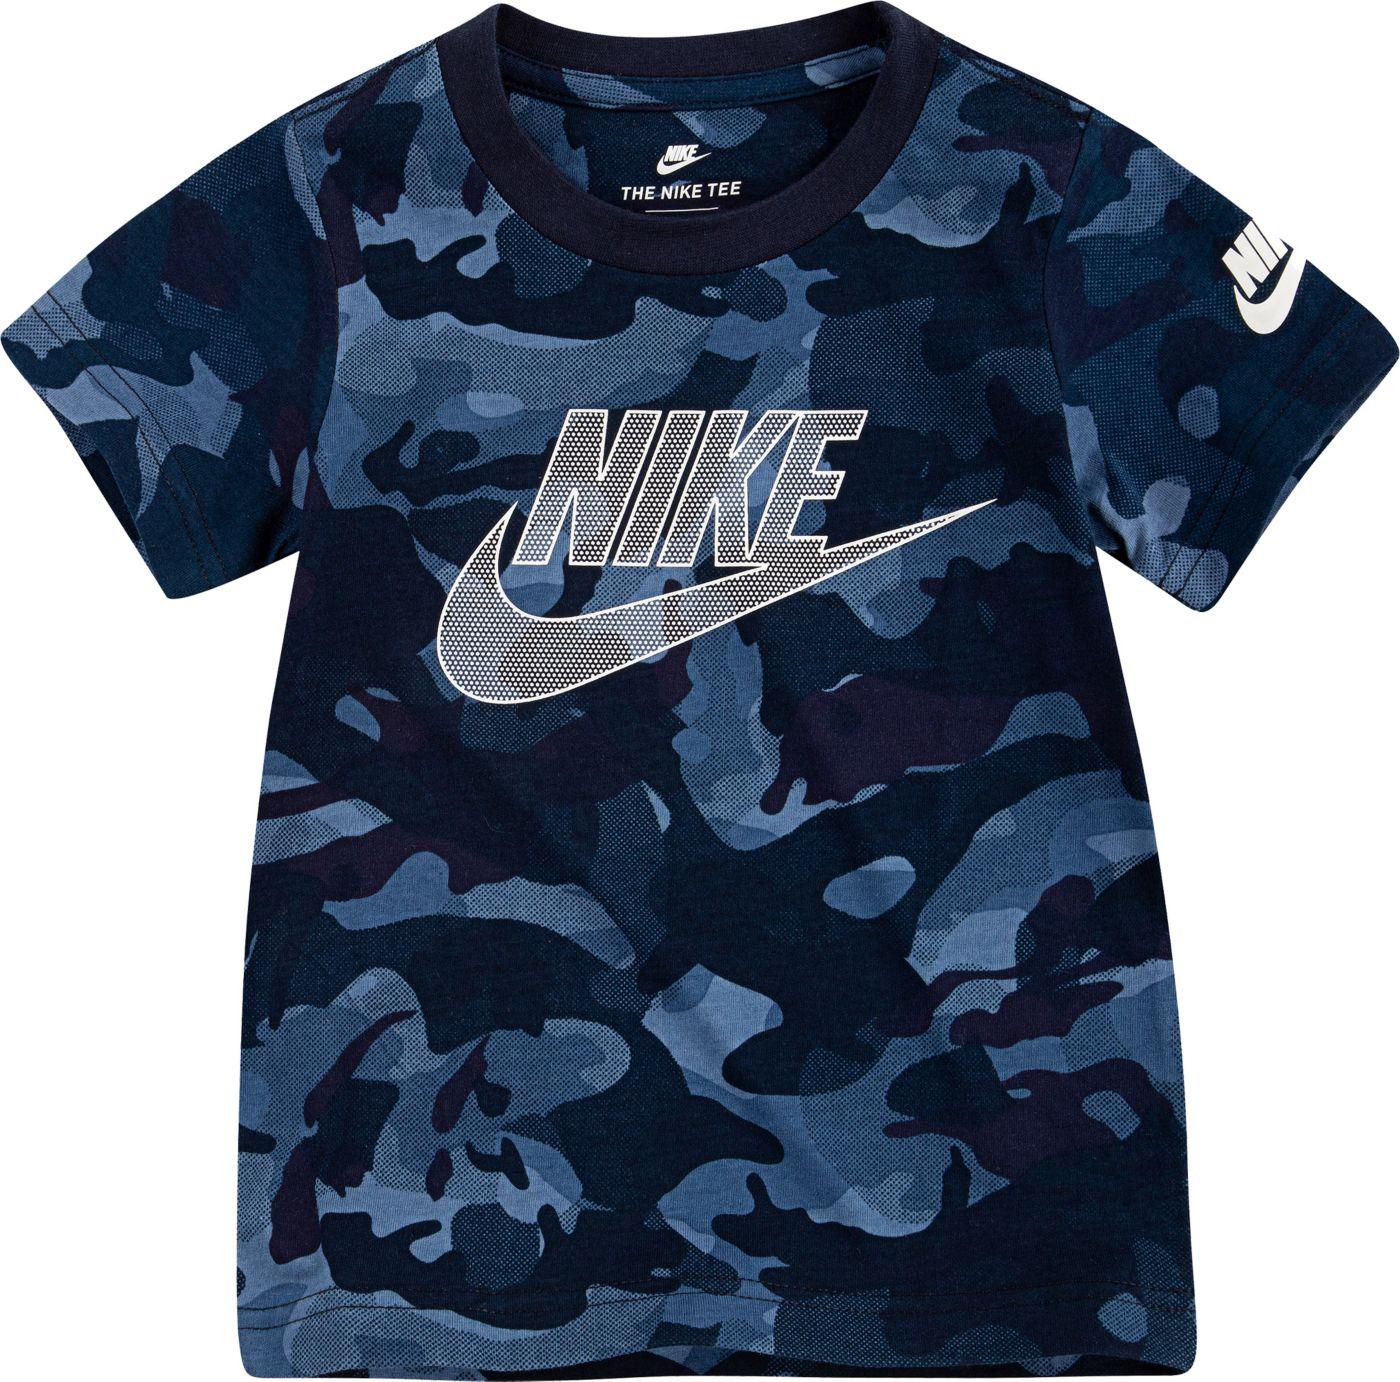 Nike Toddler Boys' Camo Graphic T-Shirt